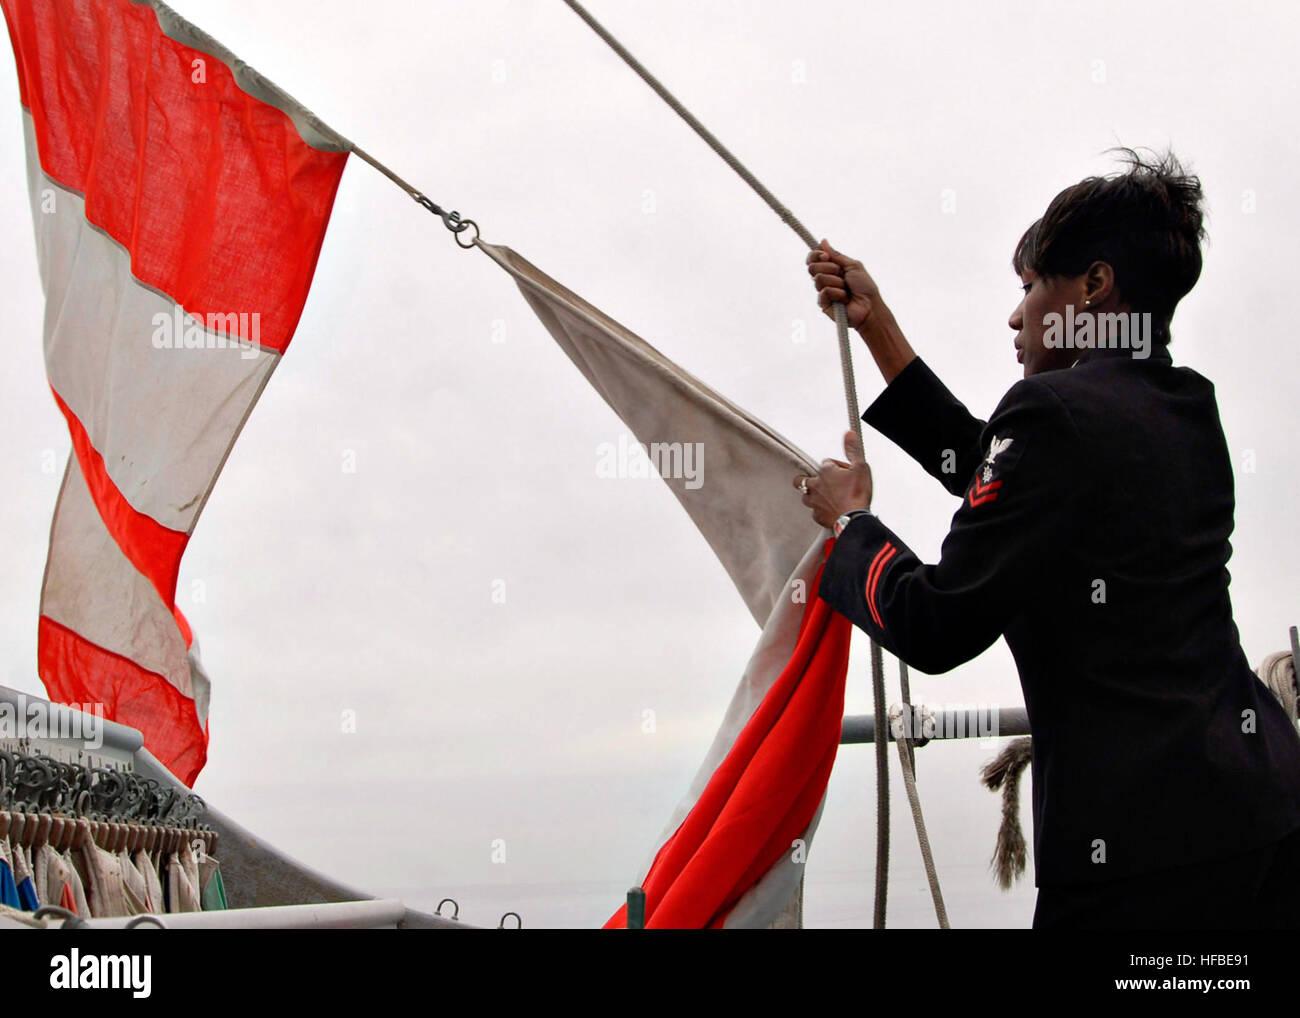 Petty Officer 2nd Class Angela Everett hoists a 'Code Hotel' flag aboard the amphibious dock landing ship - Stock Image